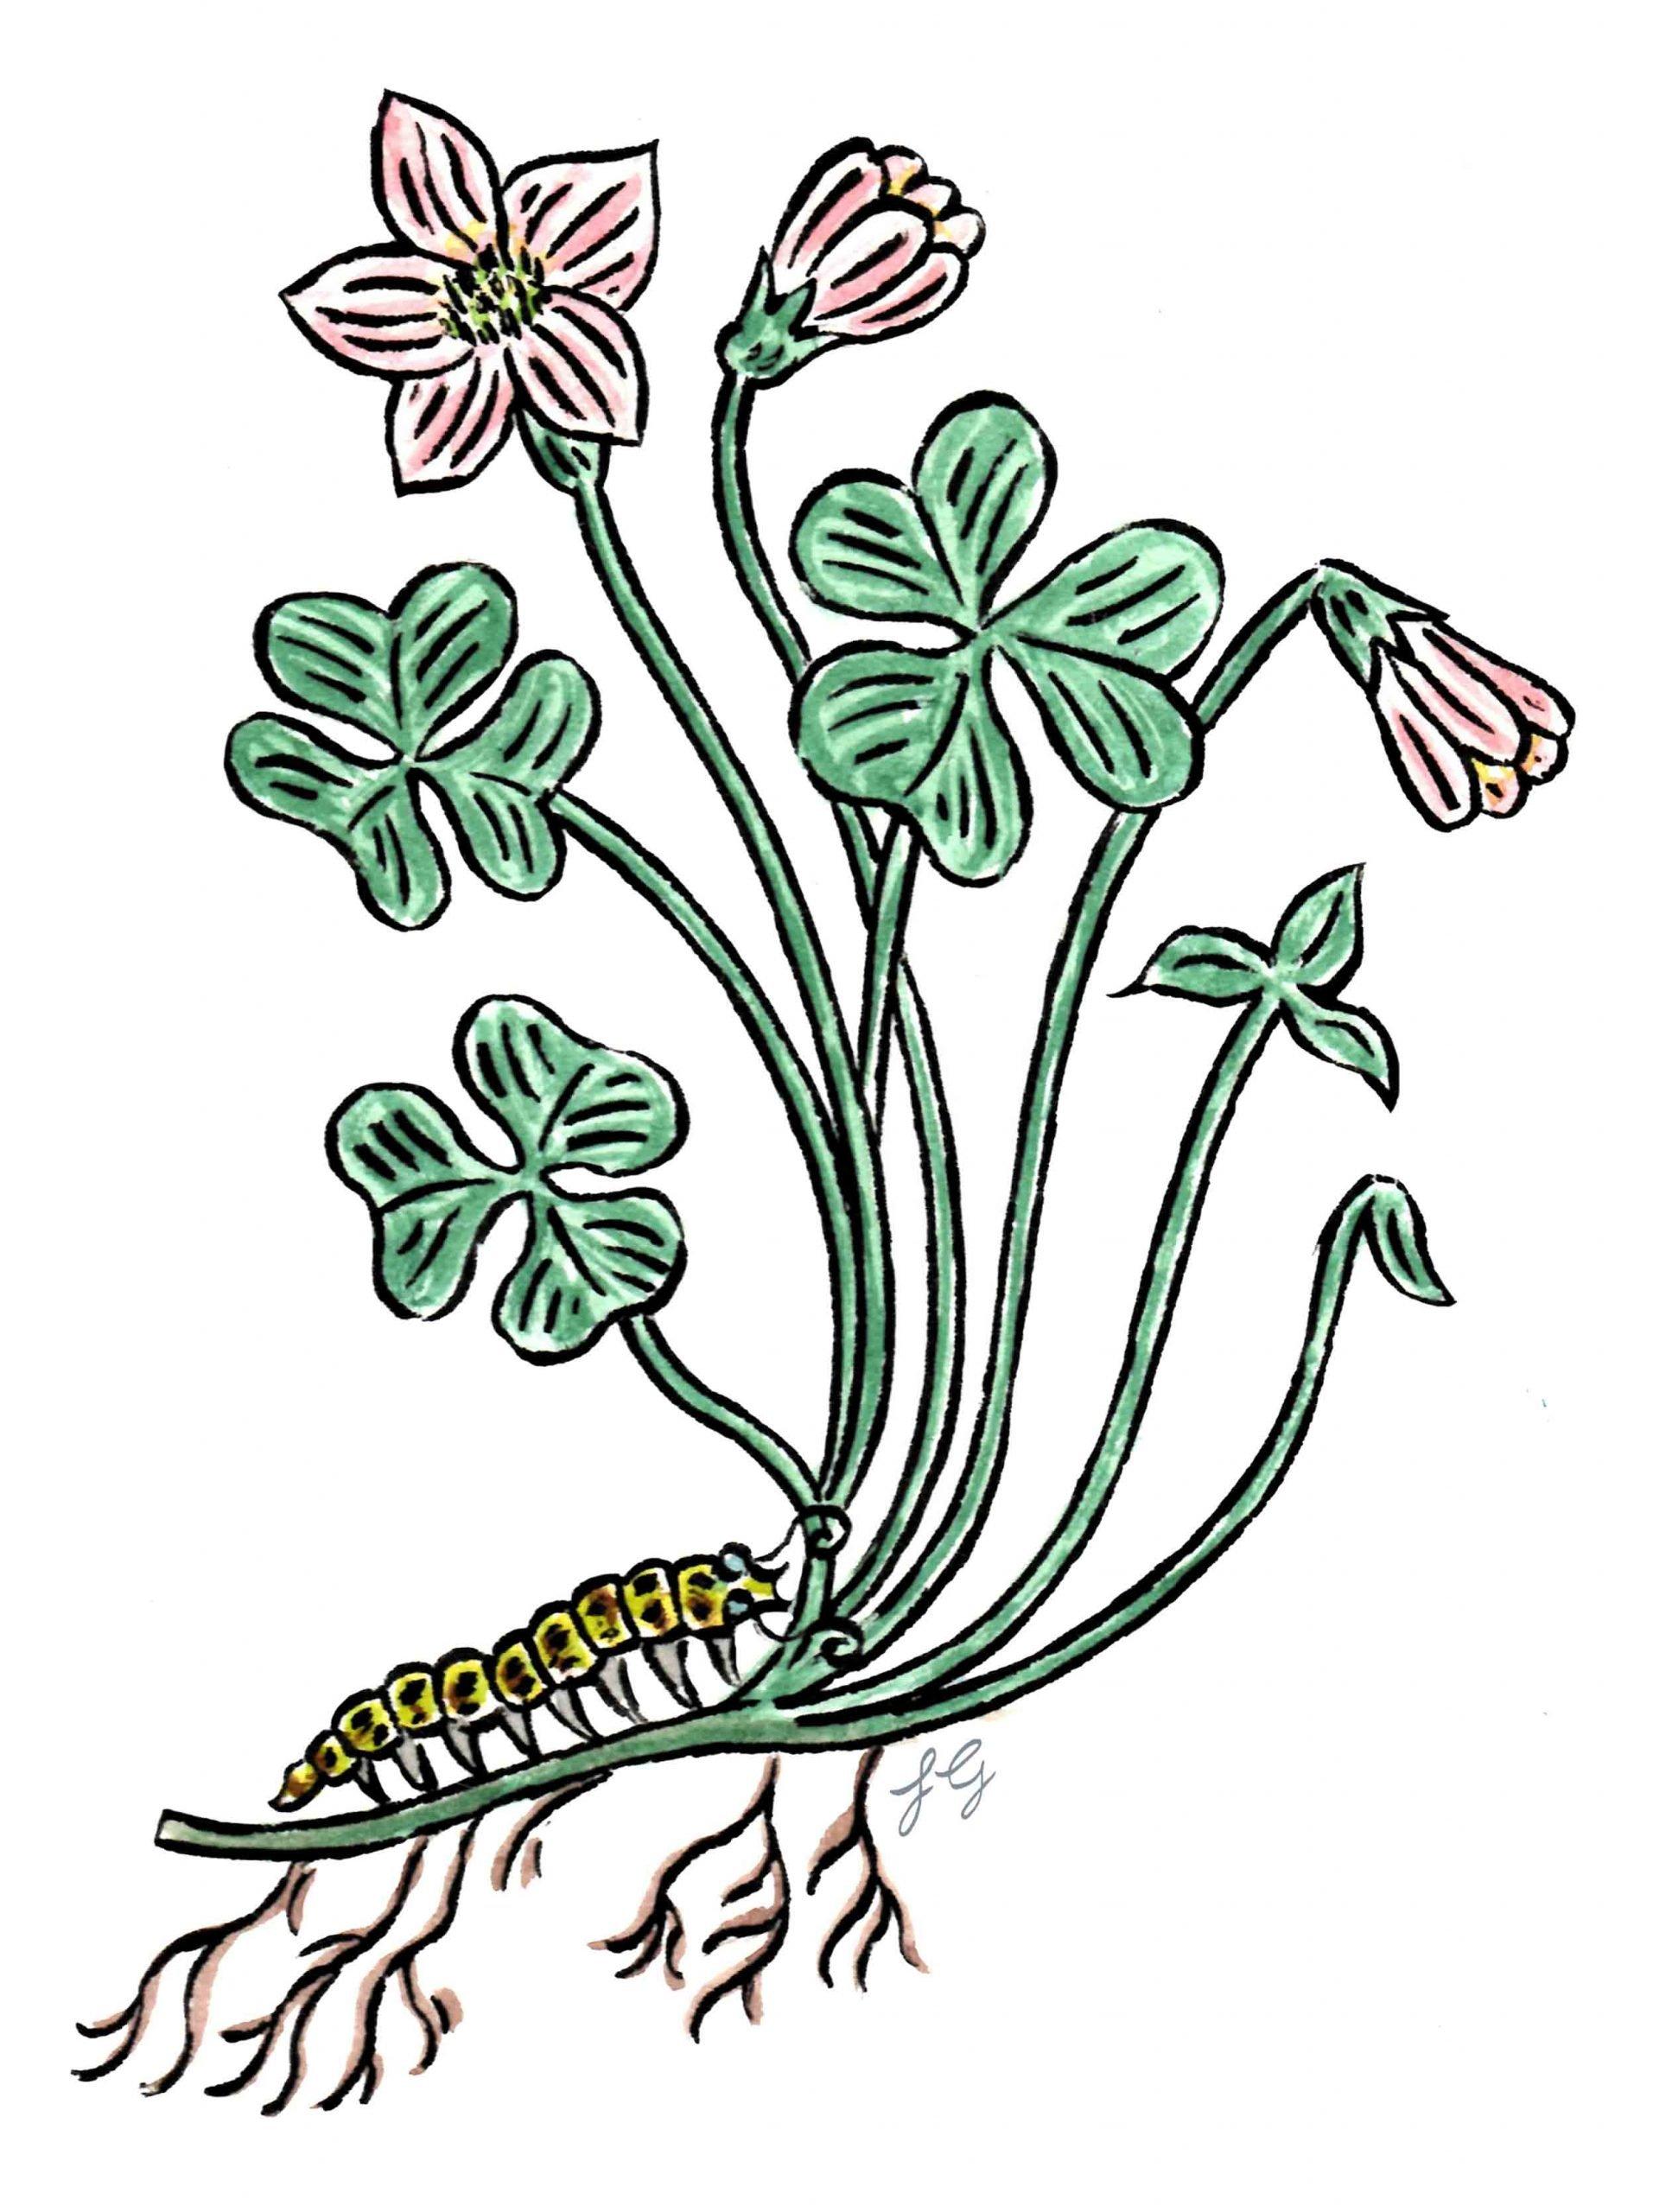 drawing of wood sorrel and caterpillar